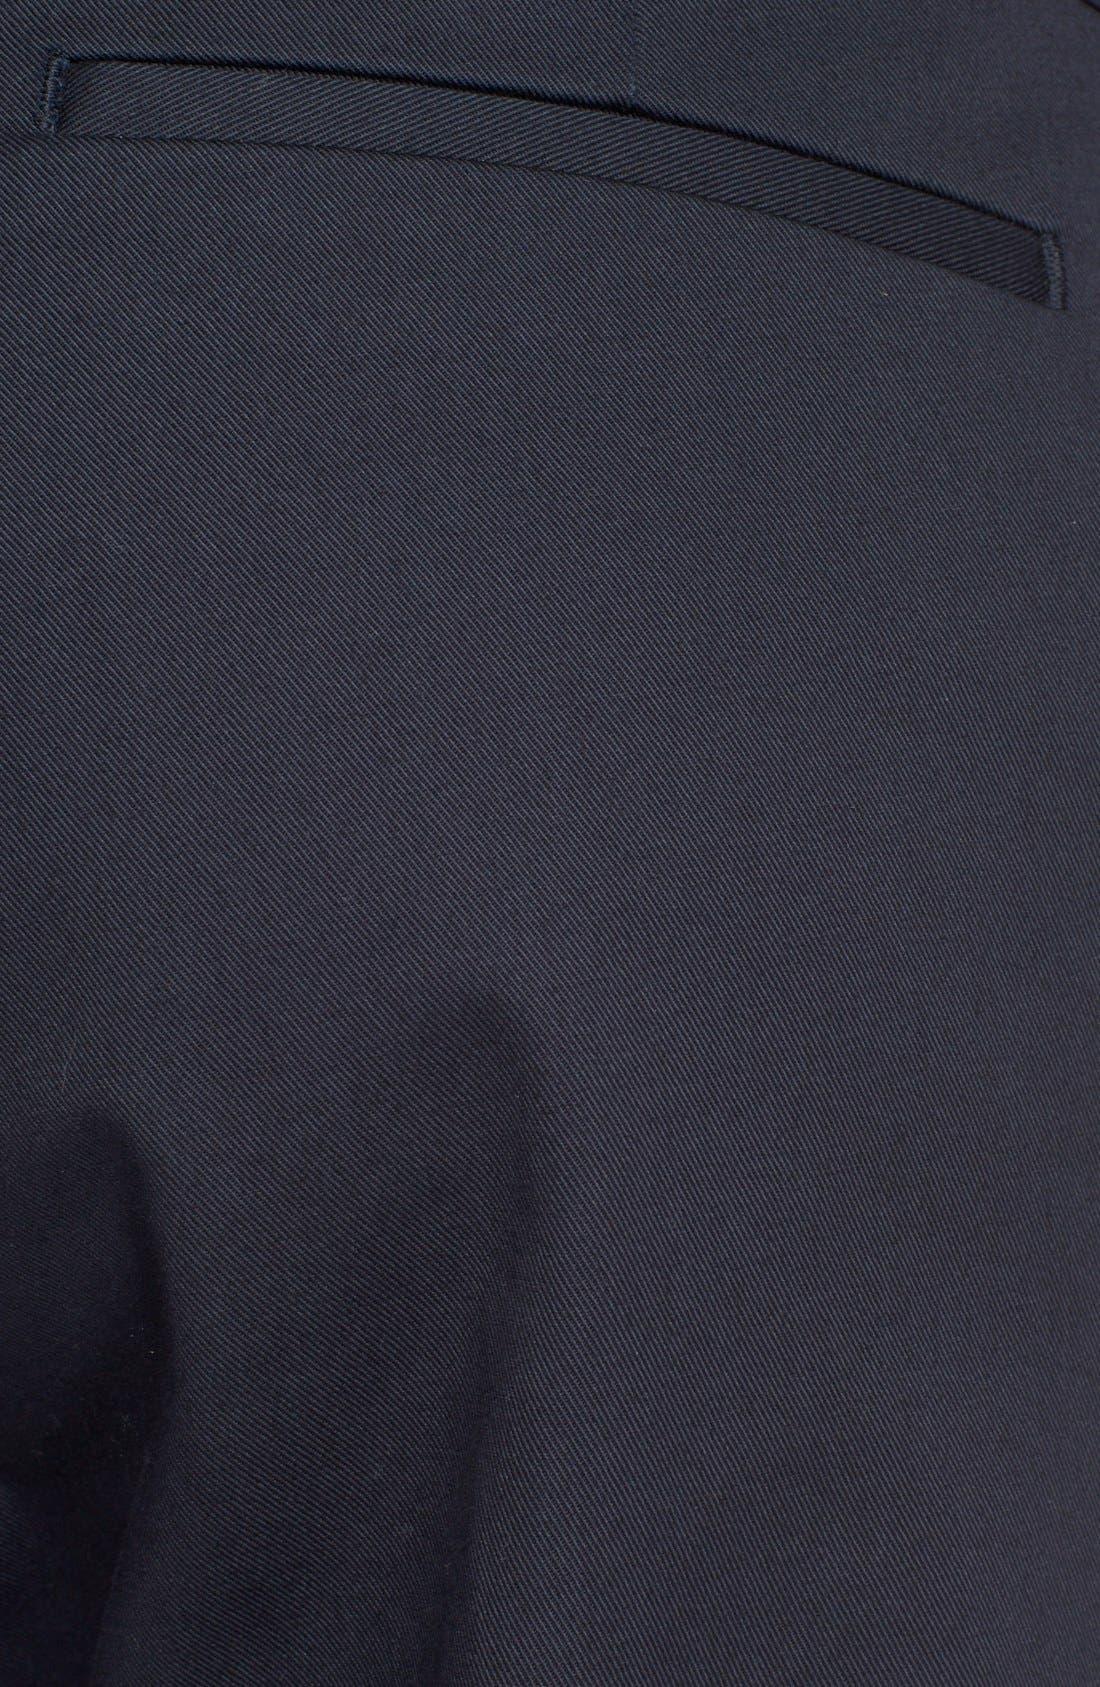 Pleated Cotton Pants,                             Alternate thumbnail 4, color,                             Dark Navy